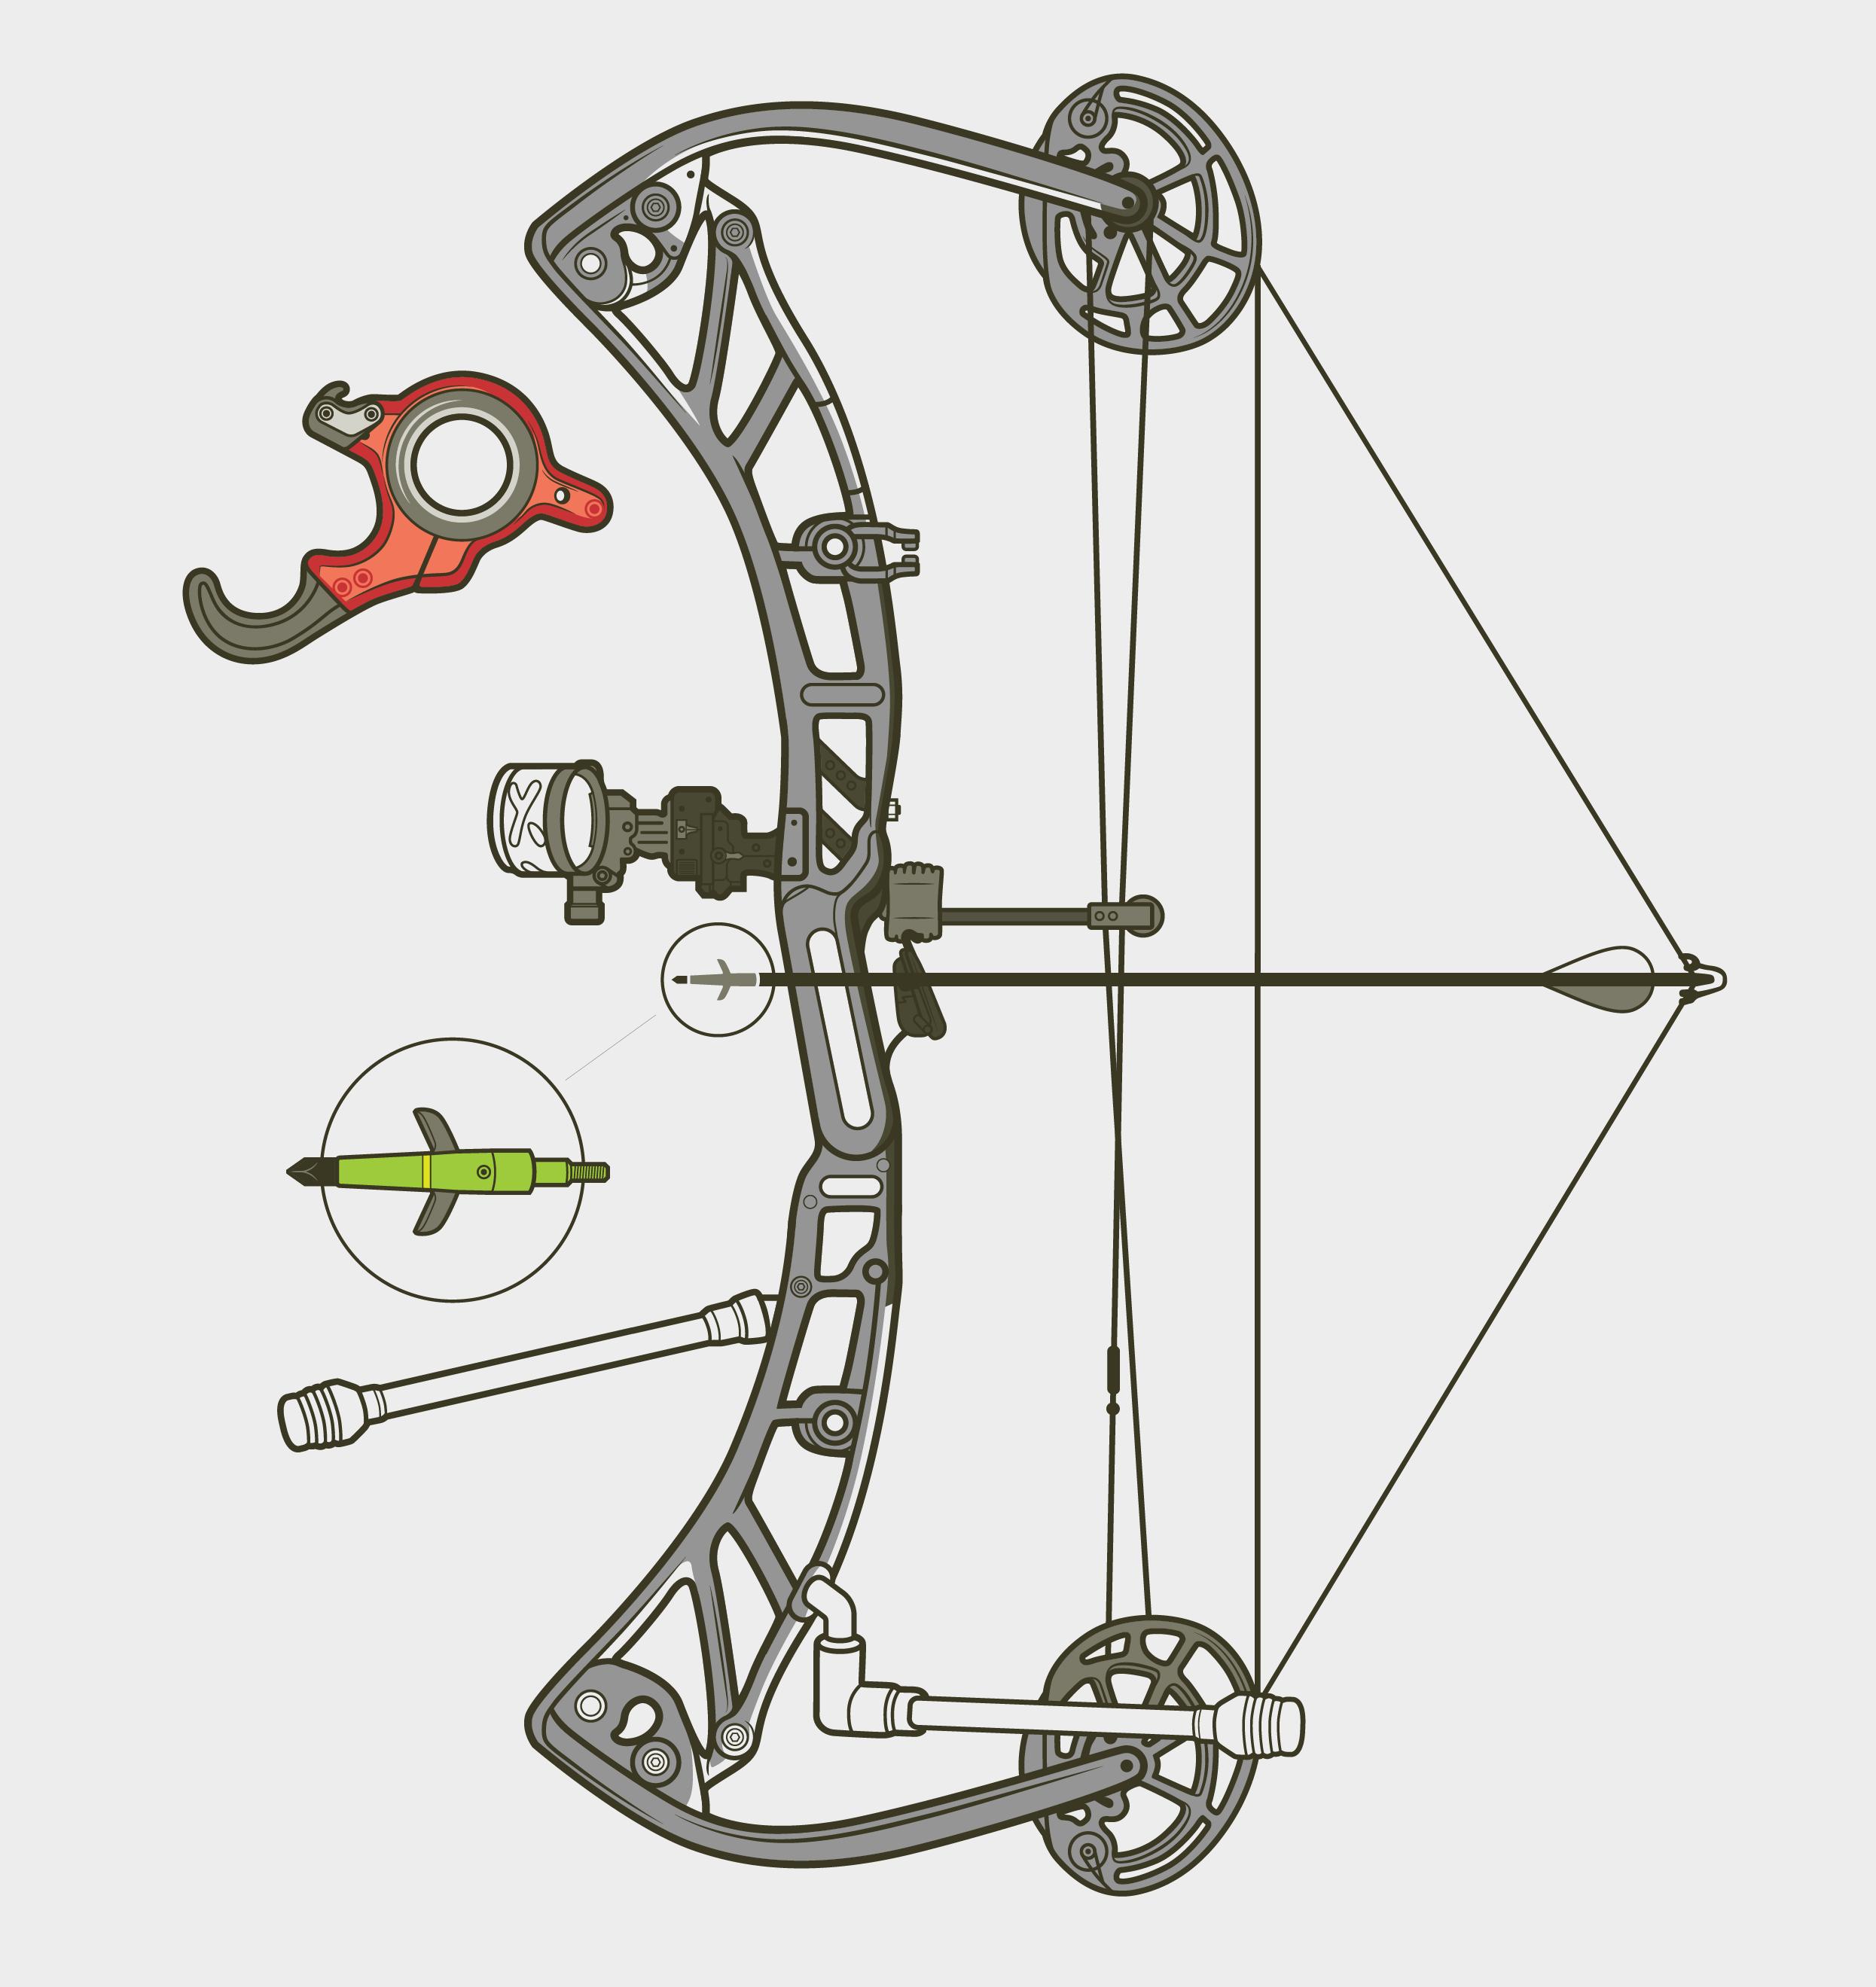 FS_Archery_Equipment_3-01.png